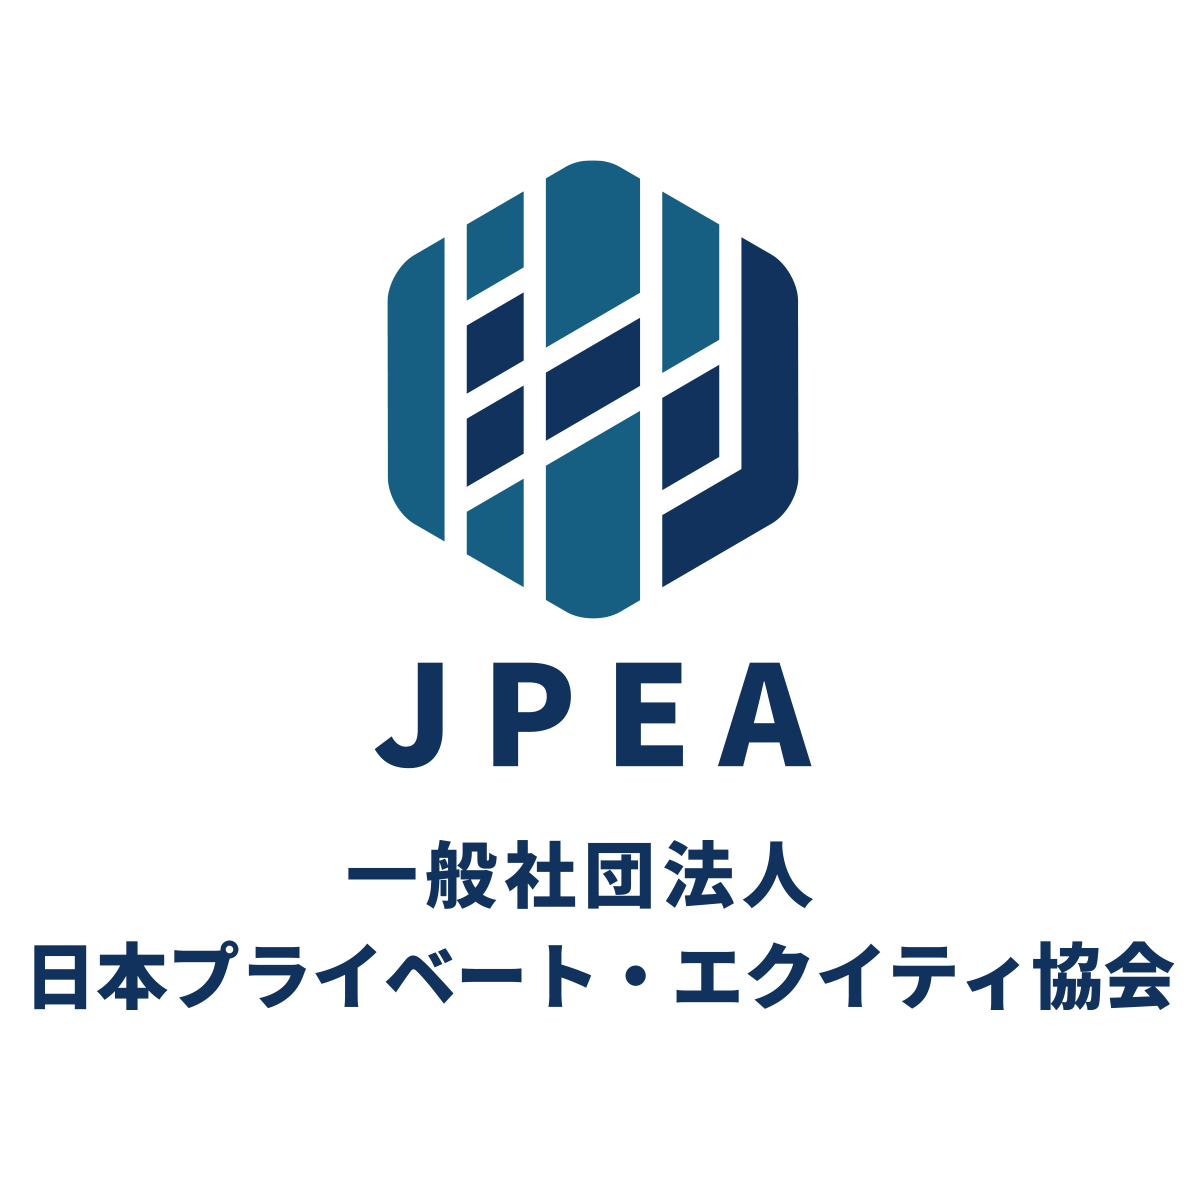 JPEA 一般社団法人日本プライベート・エクイティ協会